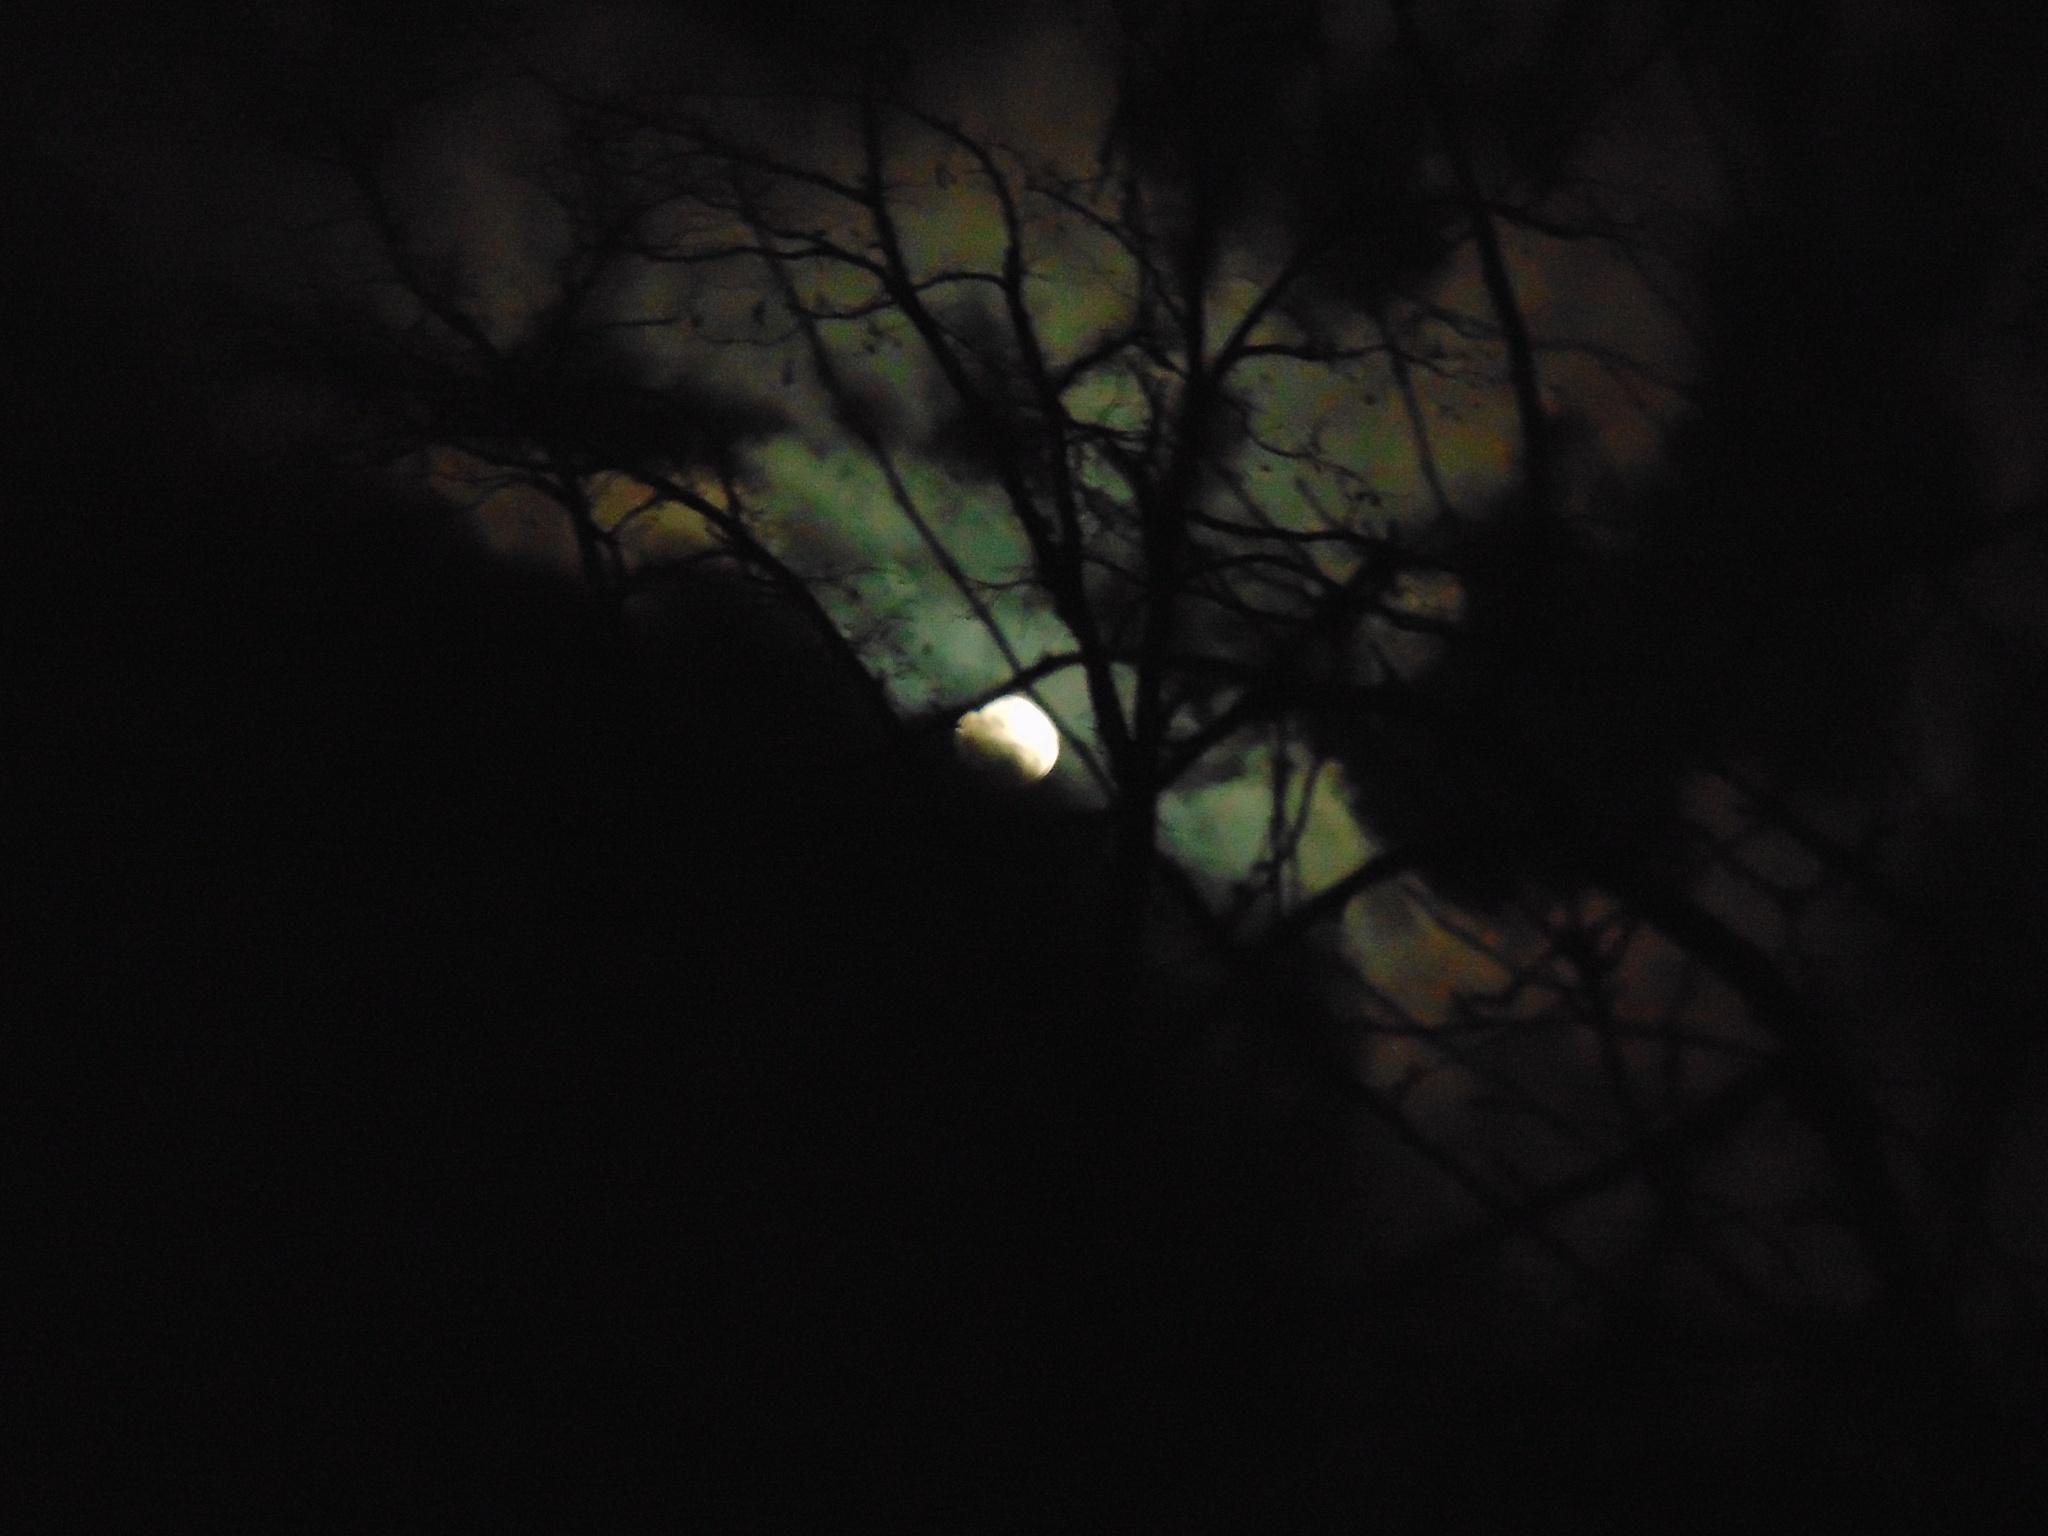 Night sky by Stefani